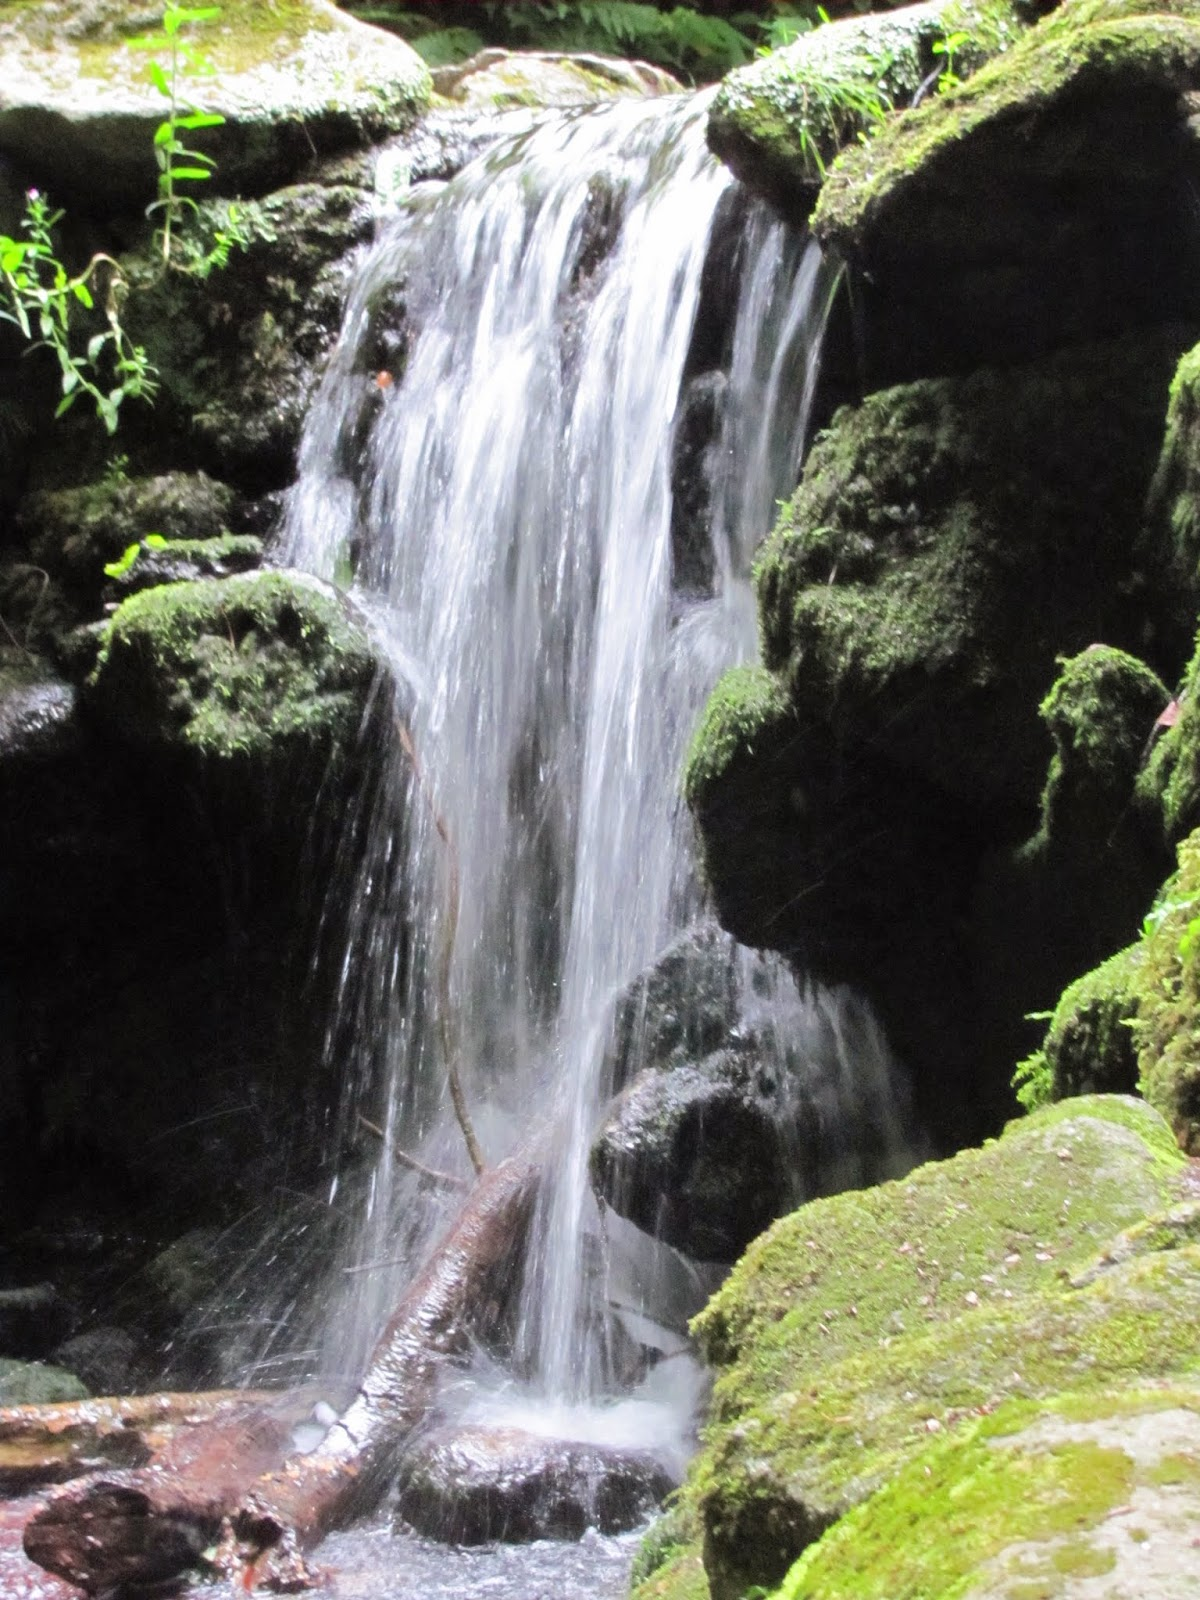 Waterfall 3 Marlay Park Dublin, Ireland